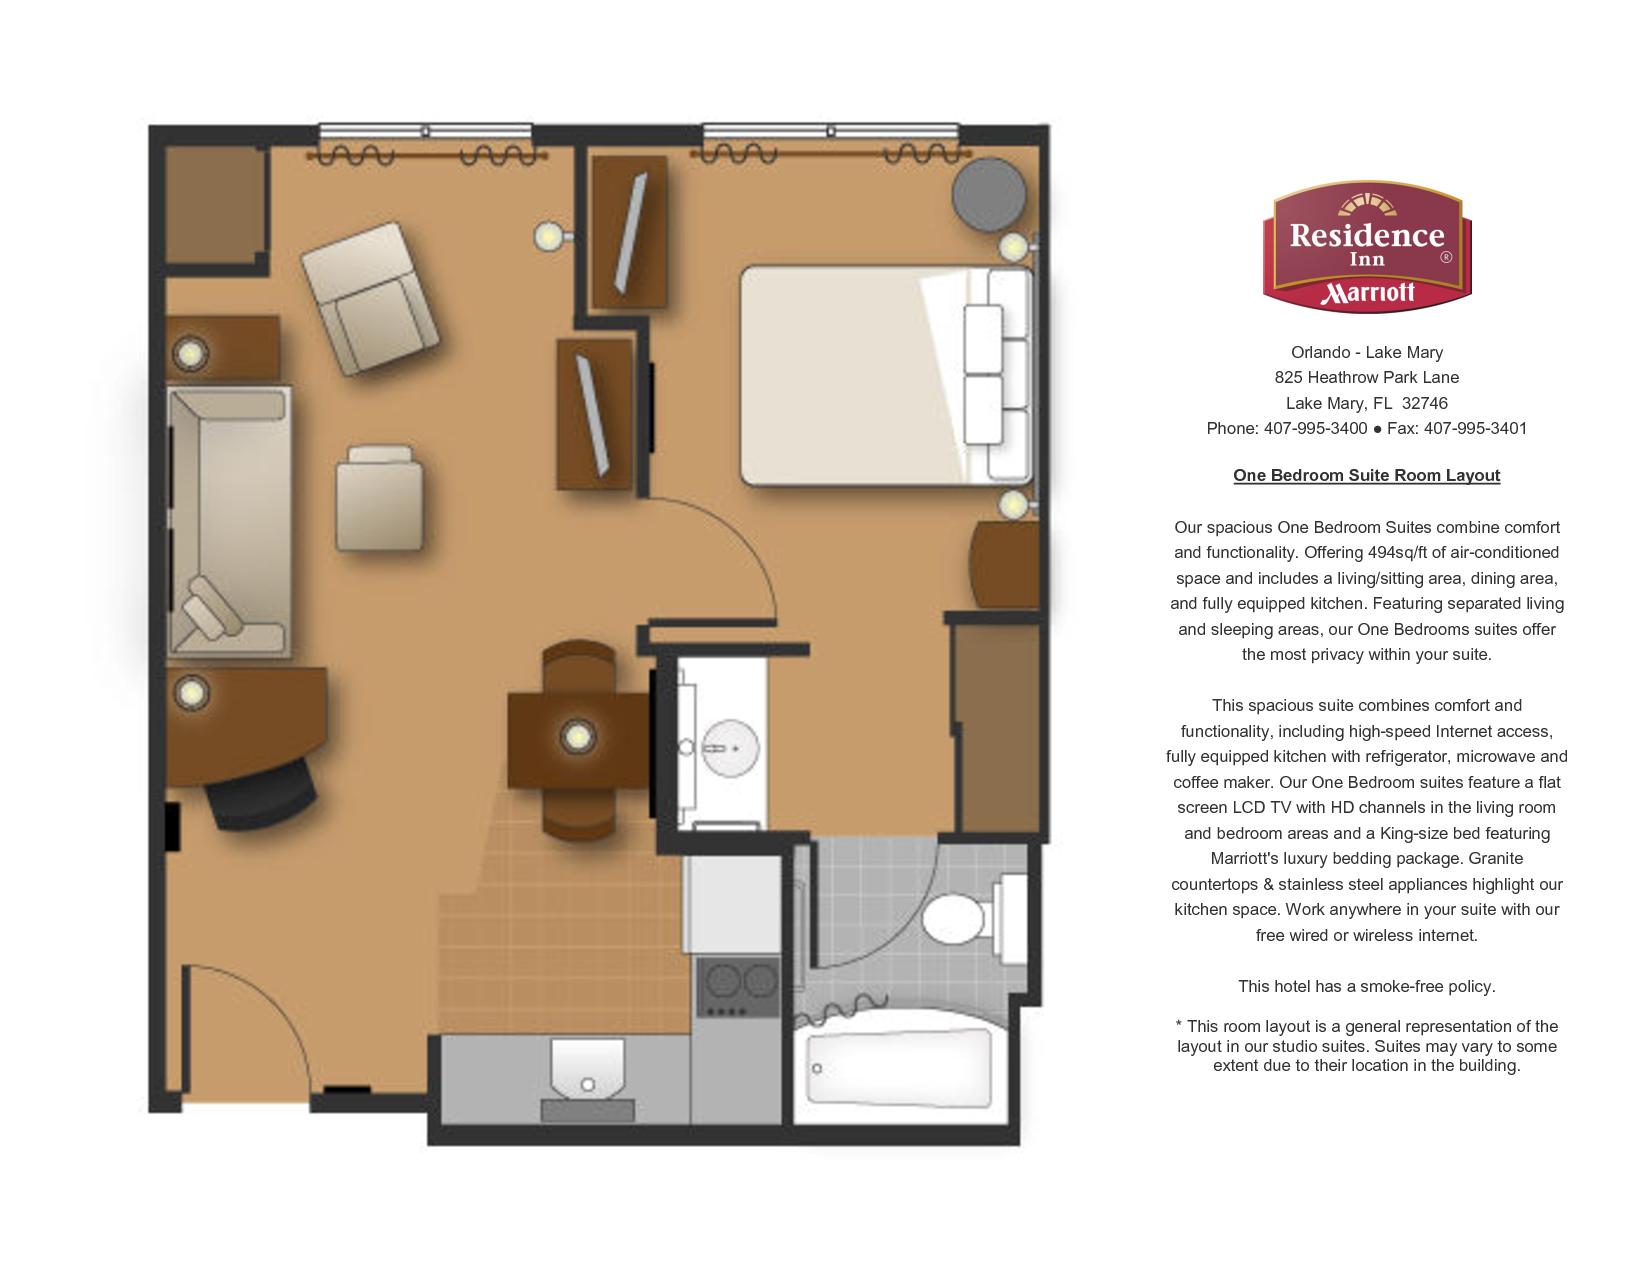 99 lazy boy 2d room planner bedroom closet door ideas check more